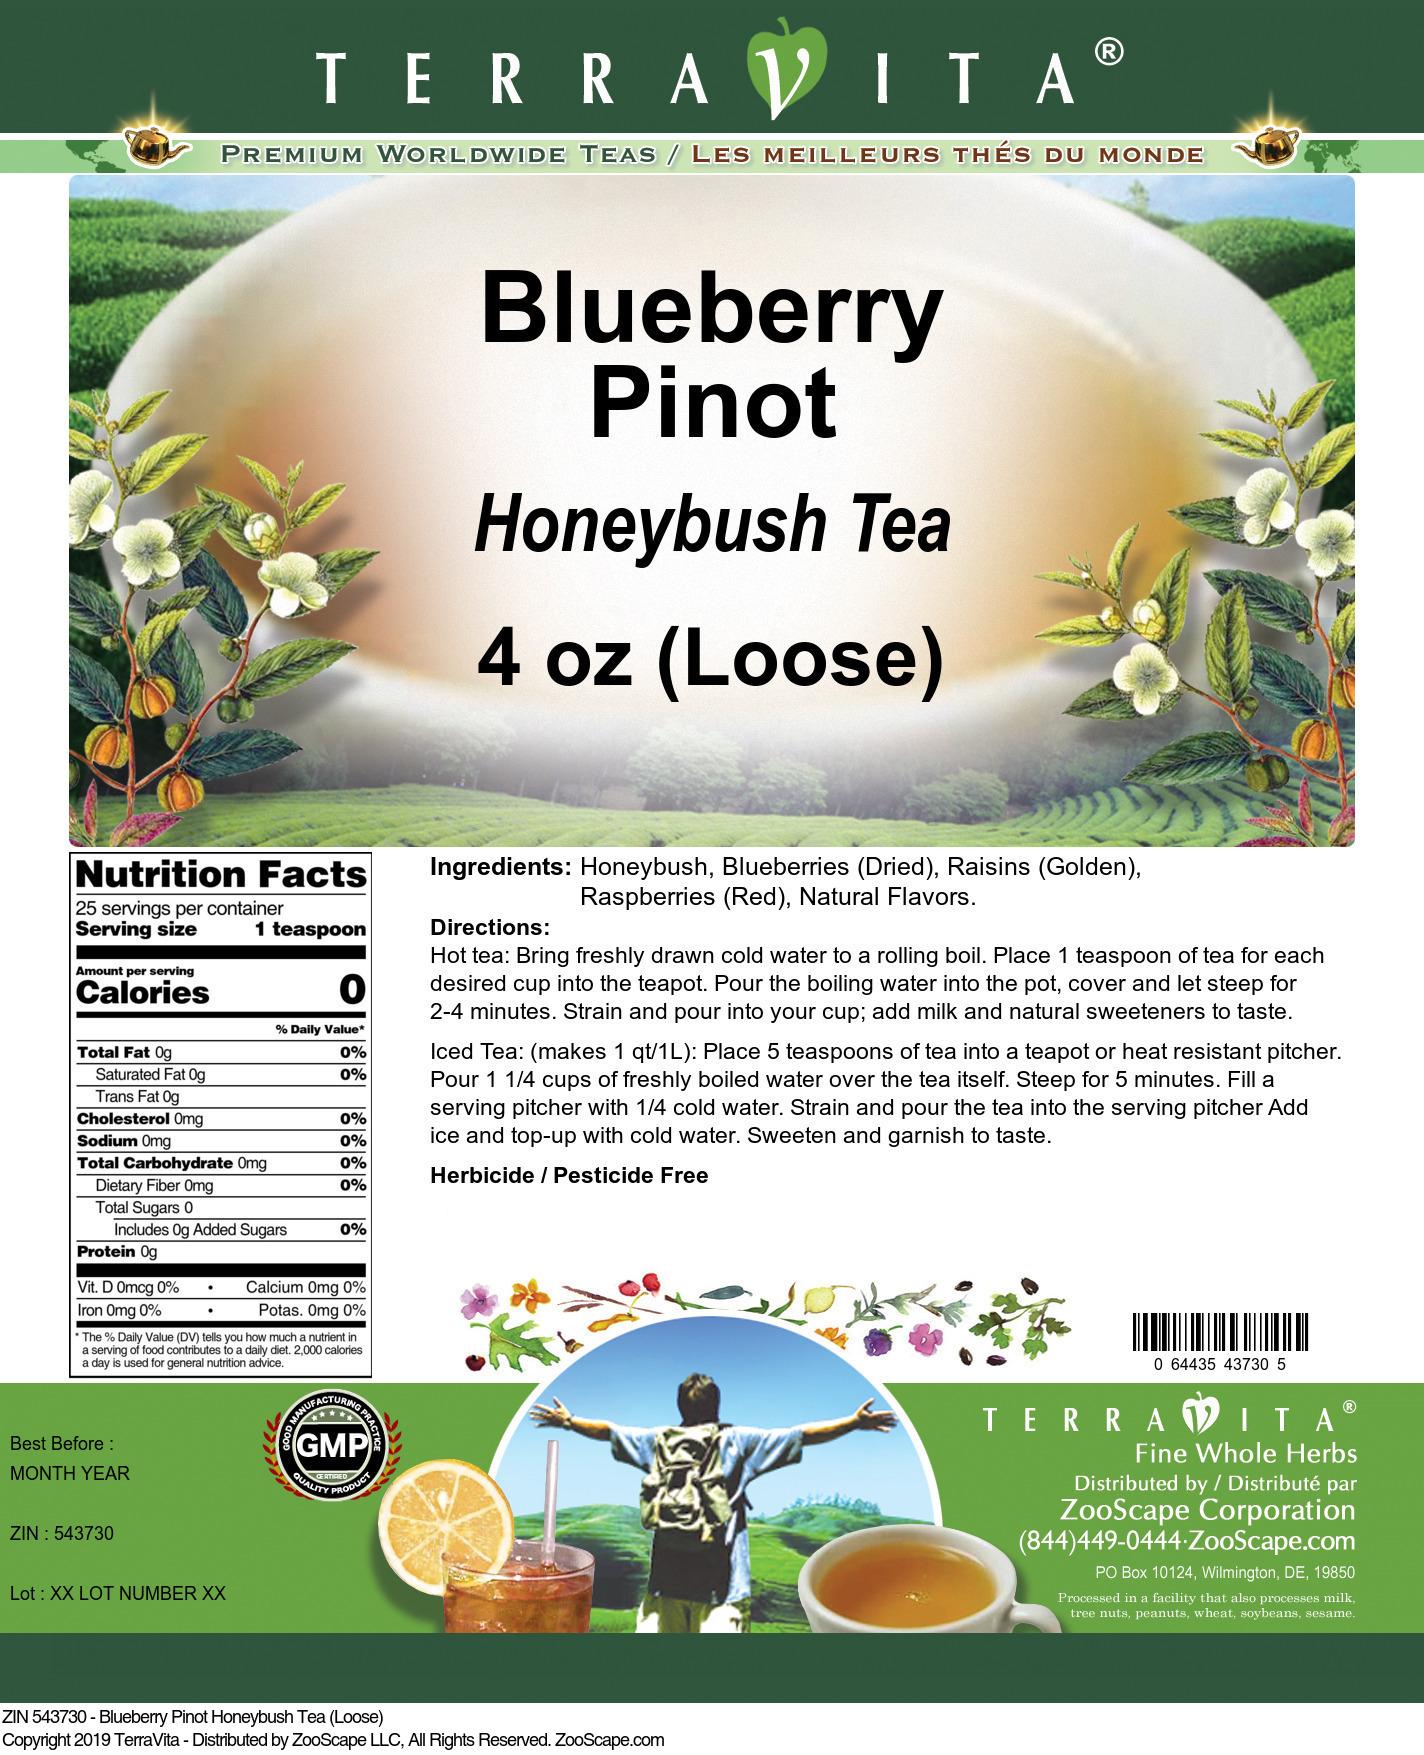 Blueberry Pinot Honeybush Tea